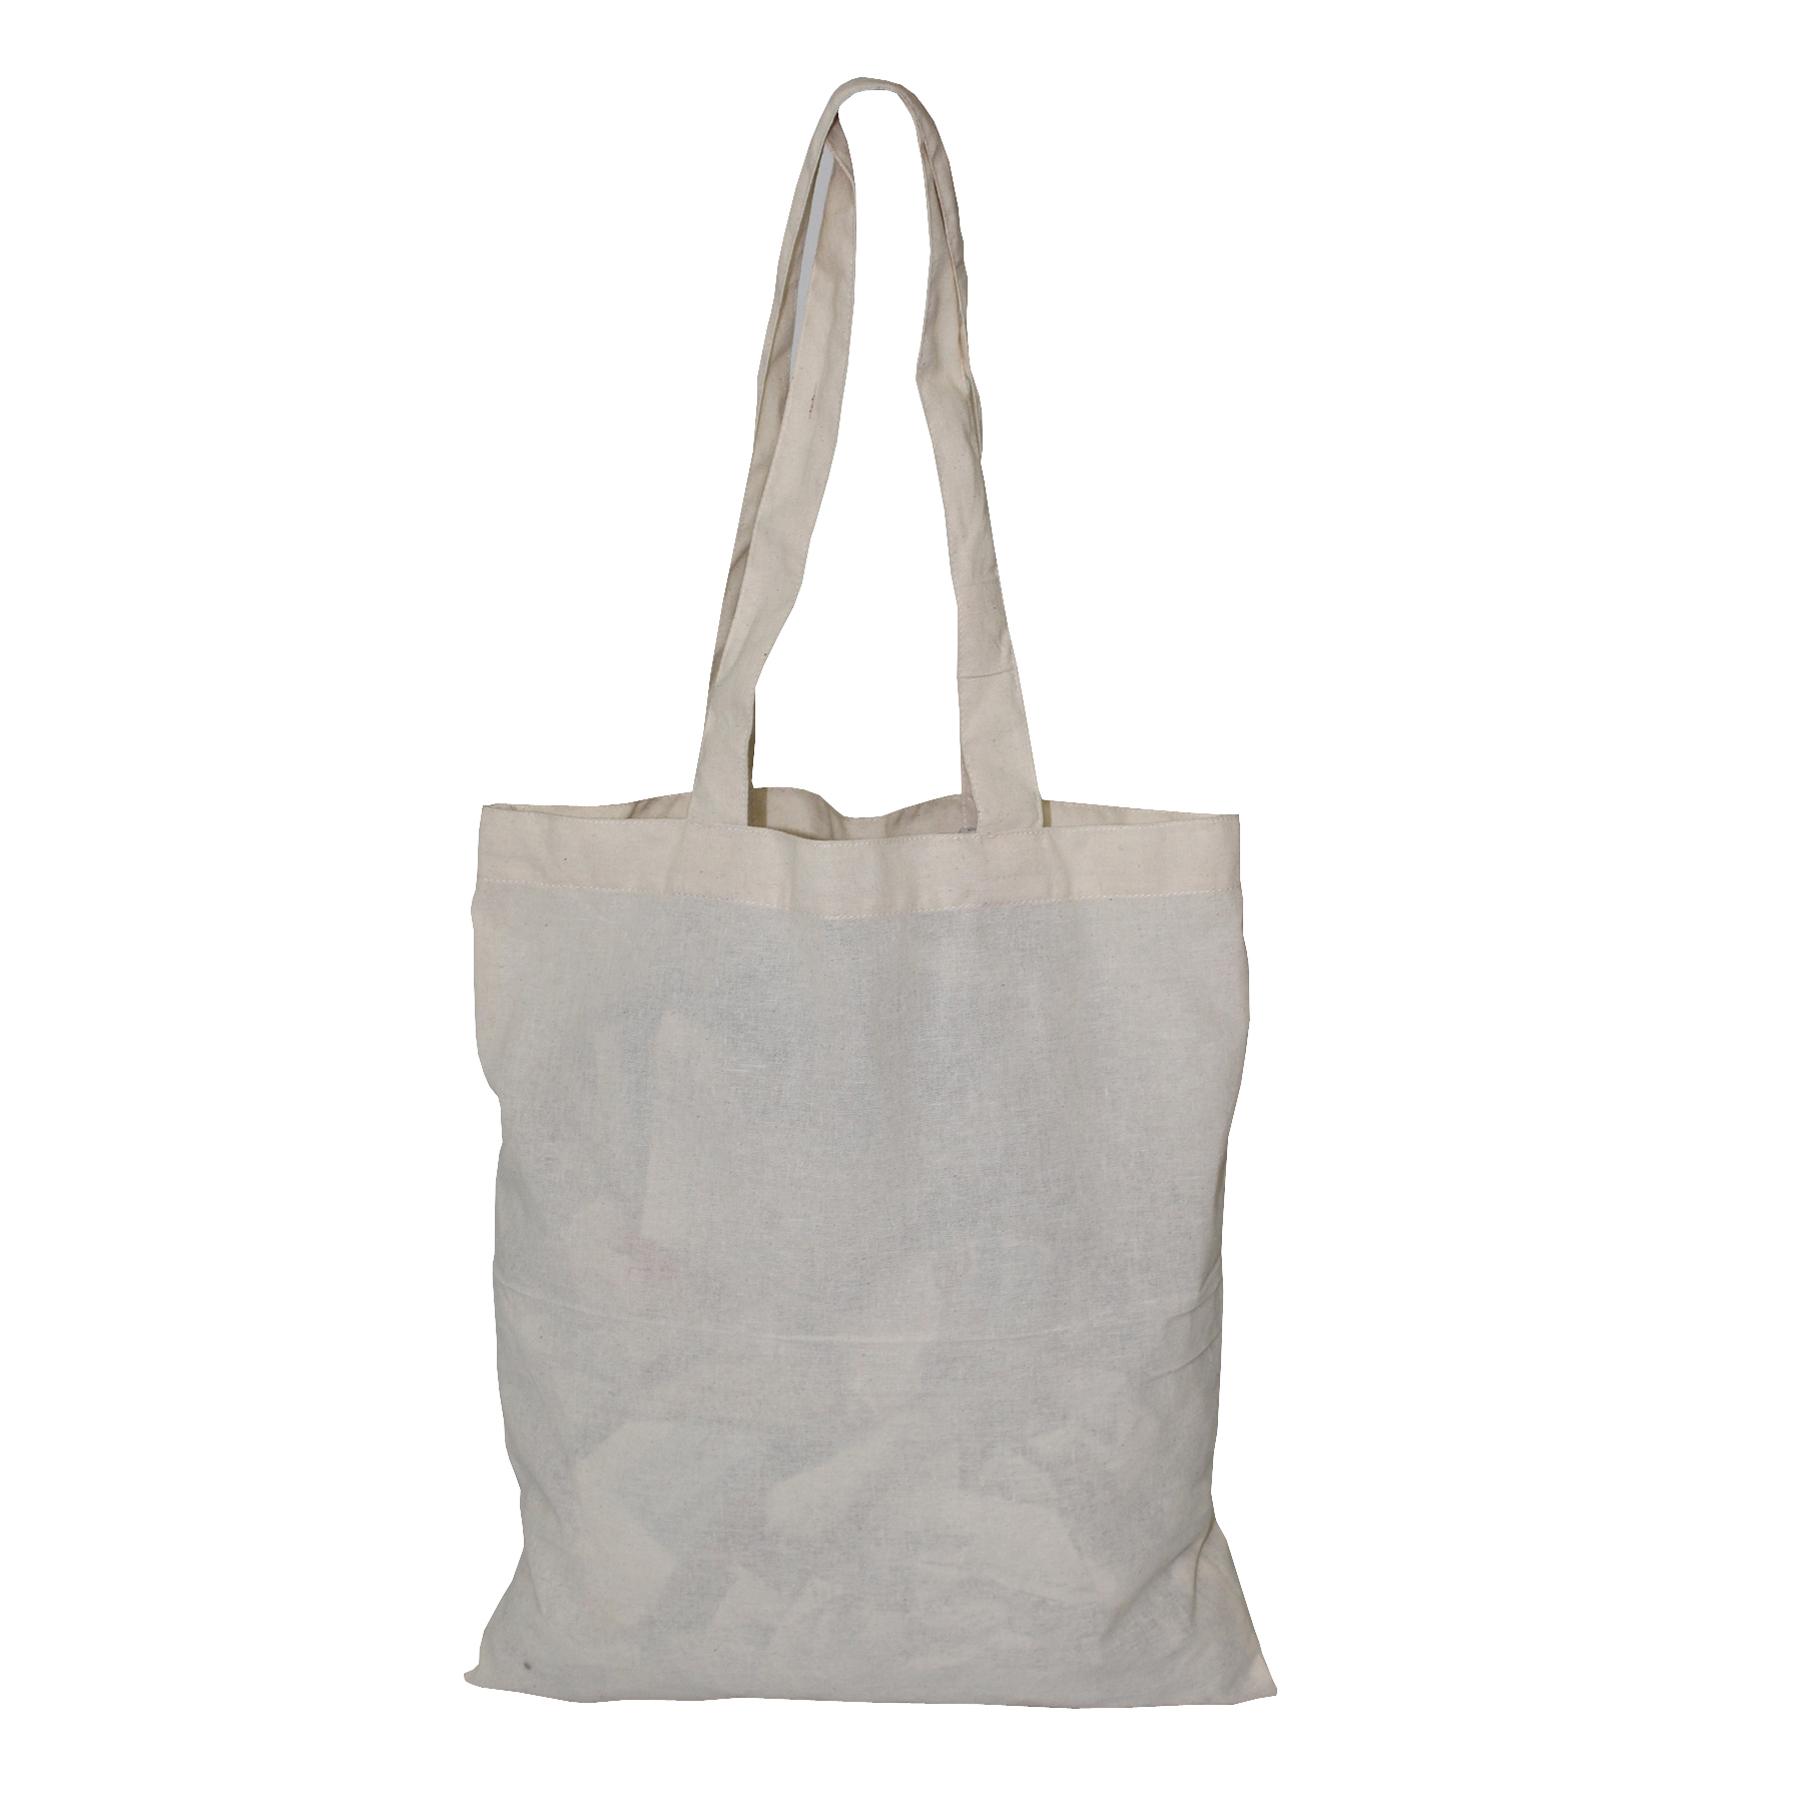 150 GSM Natural Cotton Grocery Bag